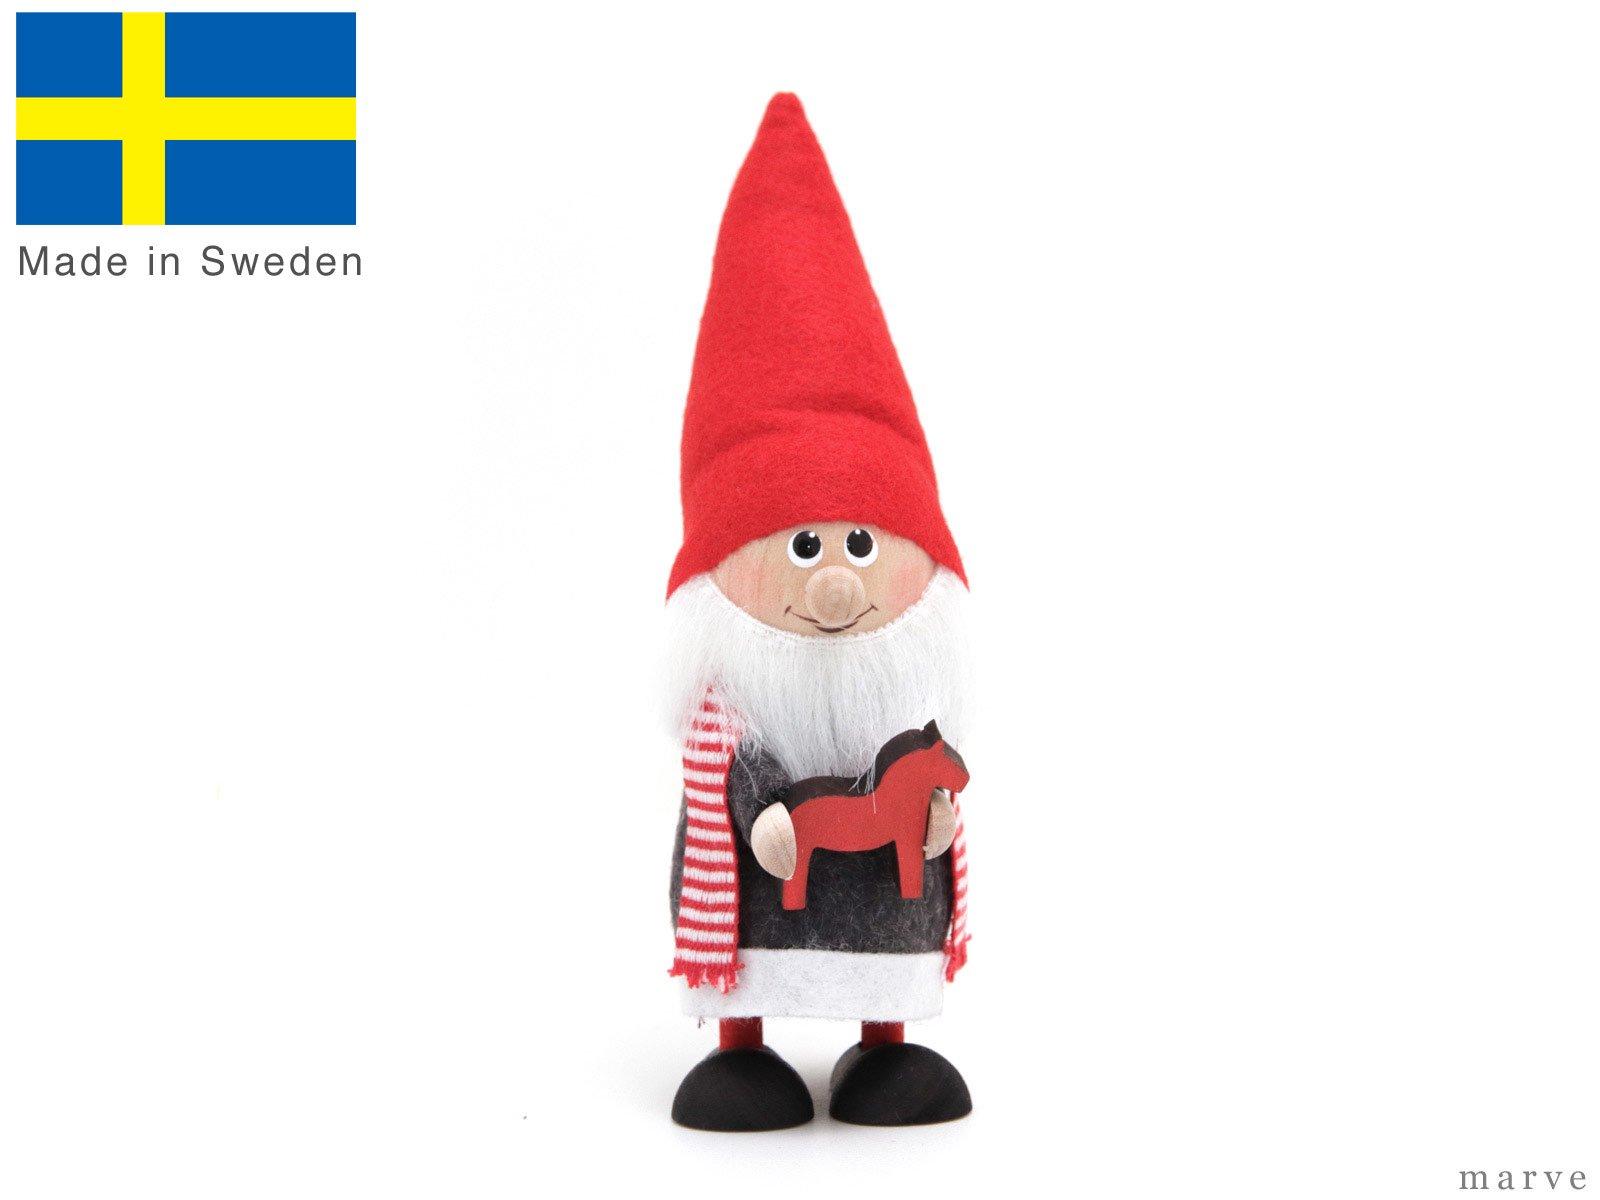 Skandinavisk Hemslojd AB トムテ人形 トムテとホース